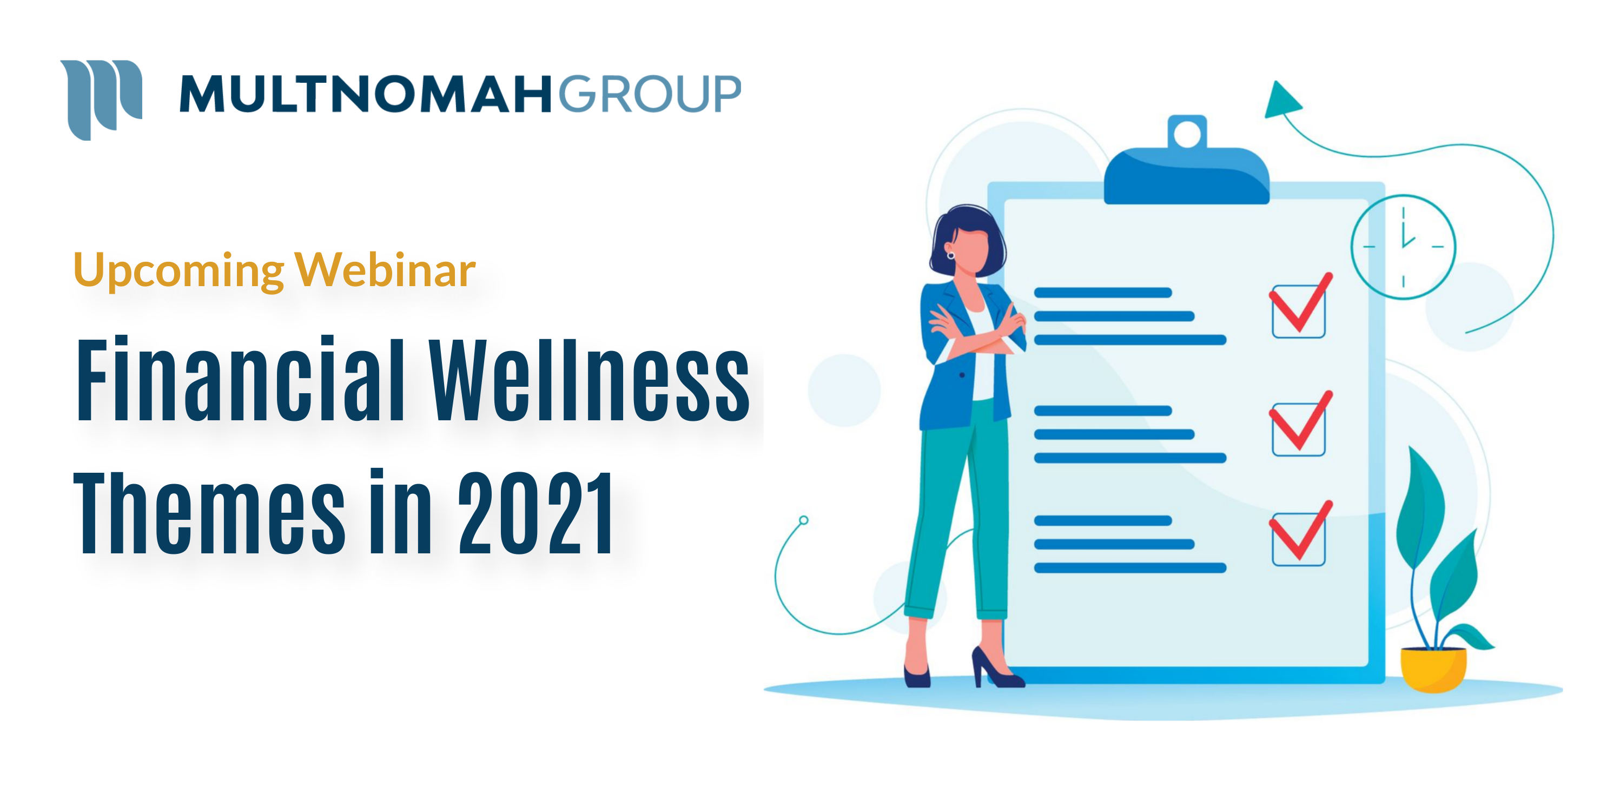 Upcoming Webinar: Financial Wellness Themes in 2021